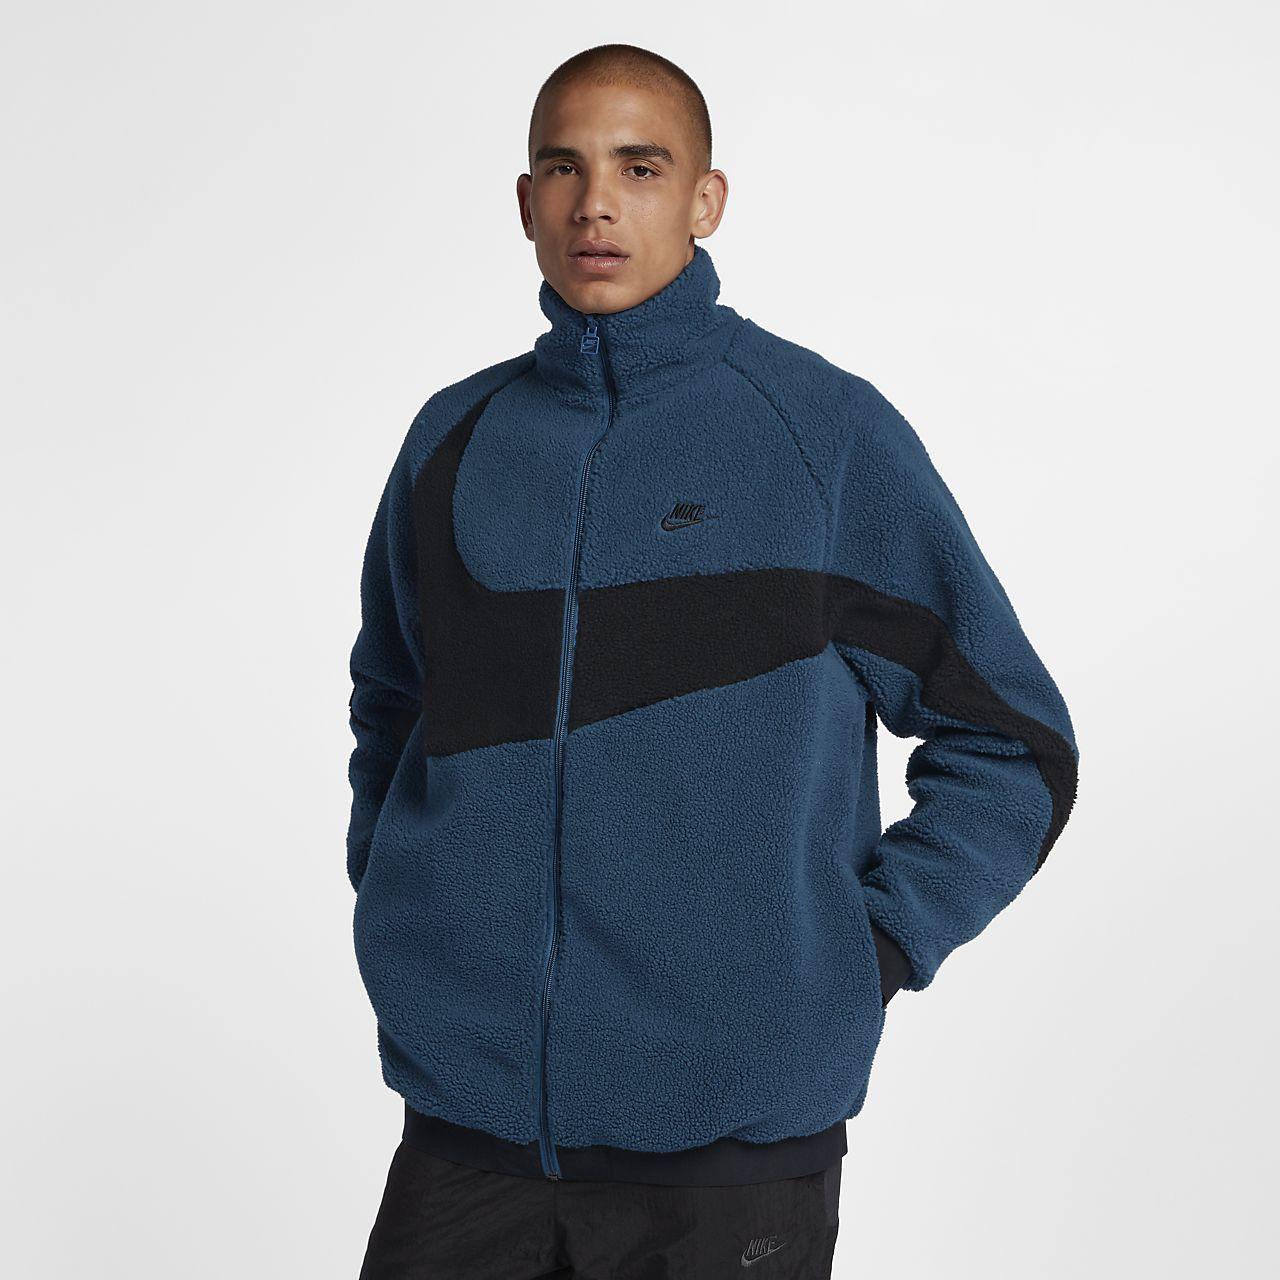 d57859882ba6e7 Nike Sportswear Reversible Jacket. Nike.com ZA